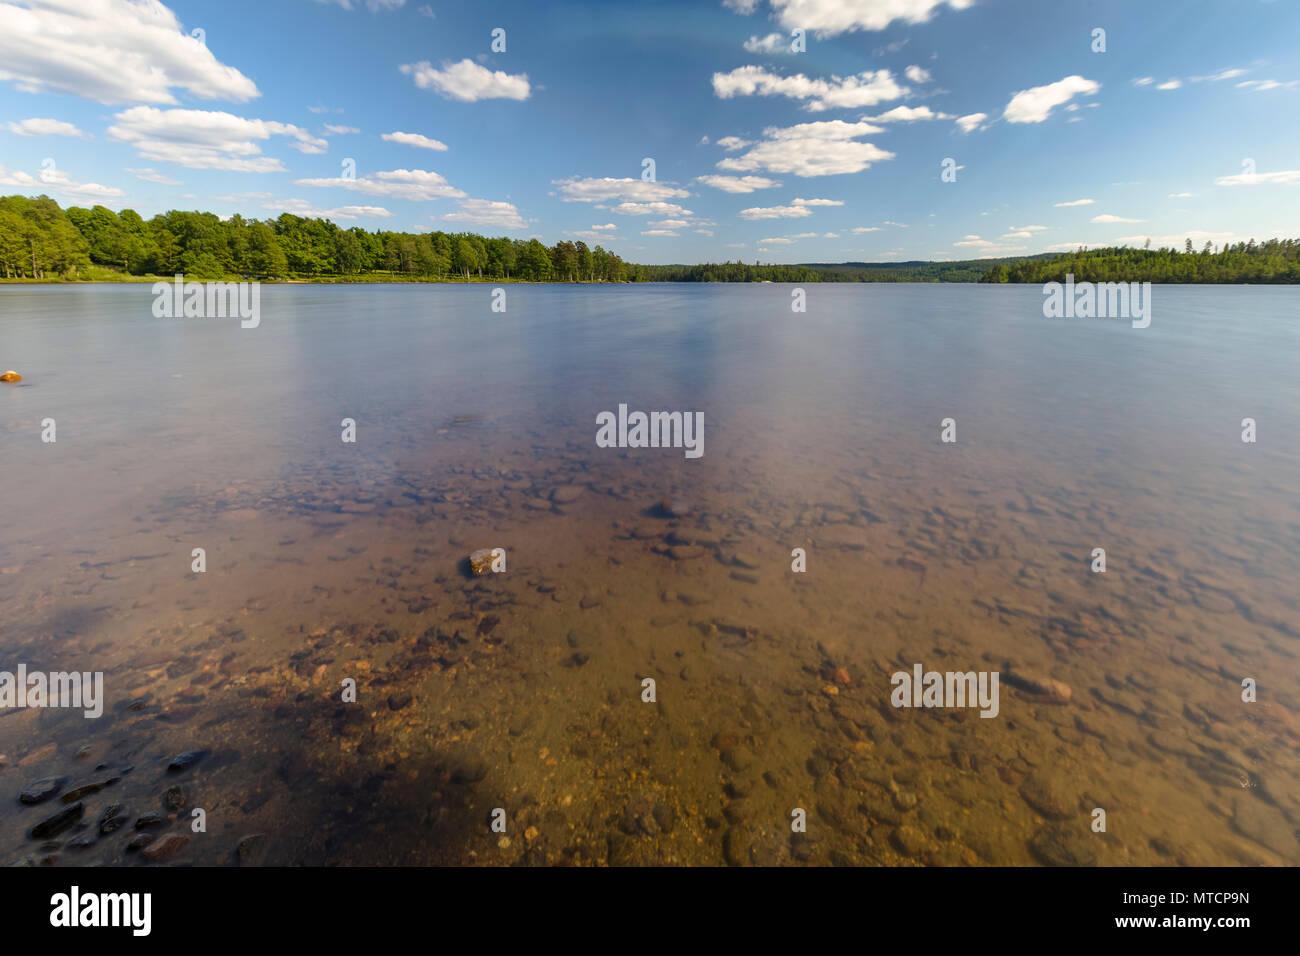 Beautiful long exposure daytime view of Lake Uspen in Lerum municipality, Sweden, on beautiful hot weather day - Stock Image